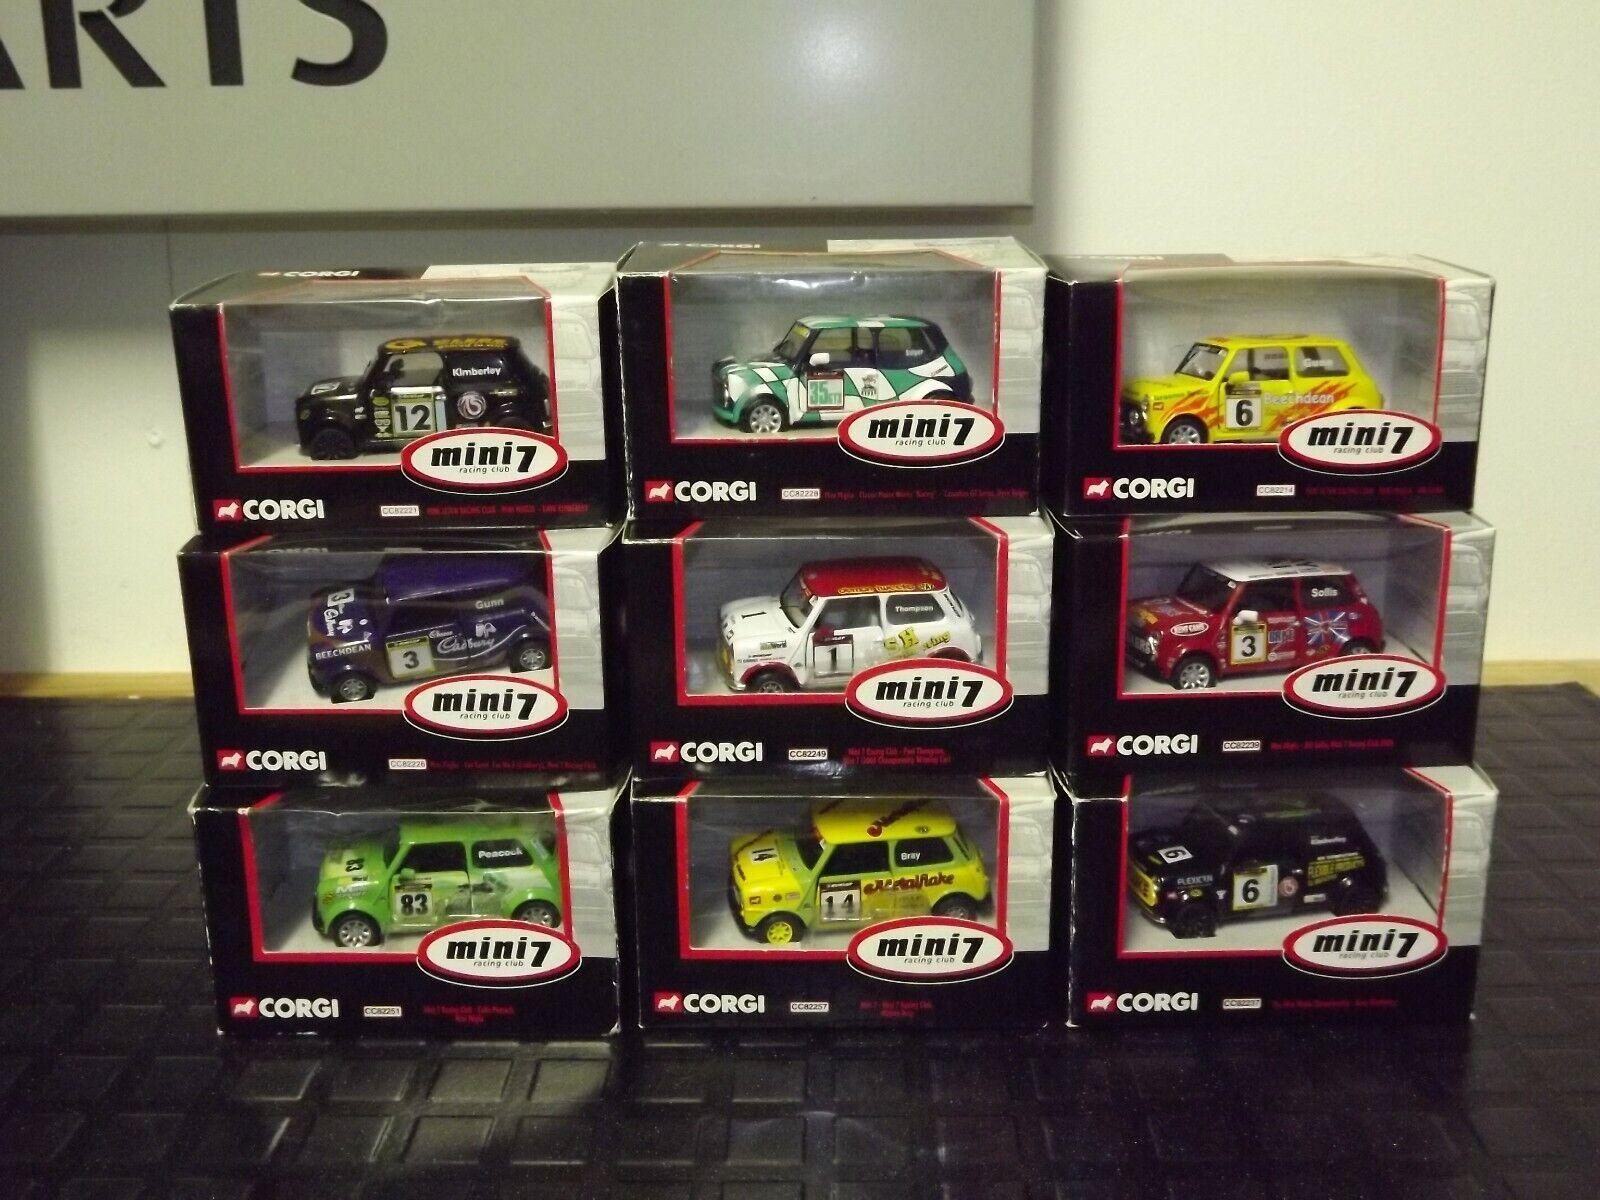 10 x KORGI - MINI 7 racing klubb - JOB massa BOXED, IDEAL FÖR KOLLECTOR